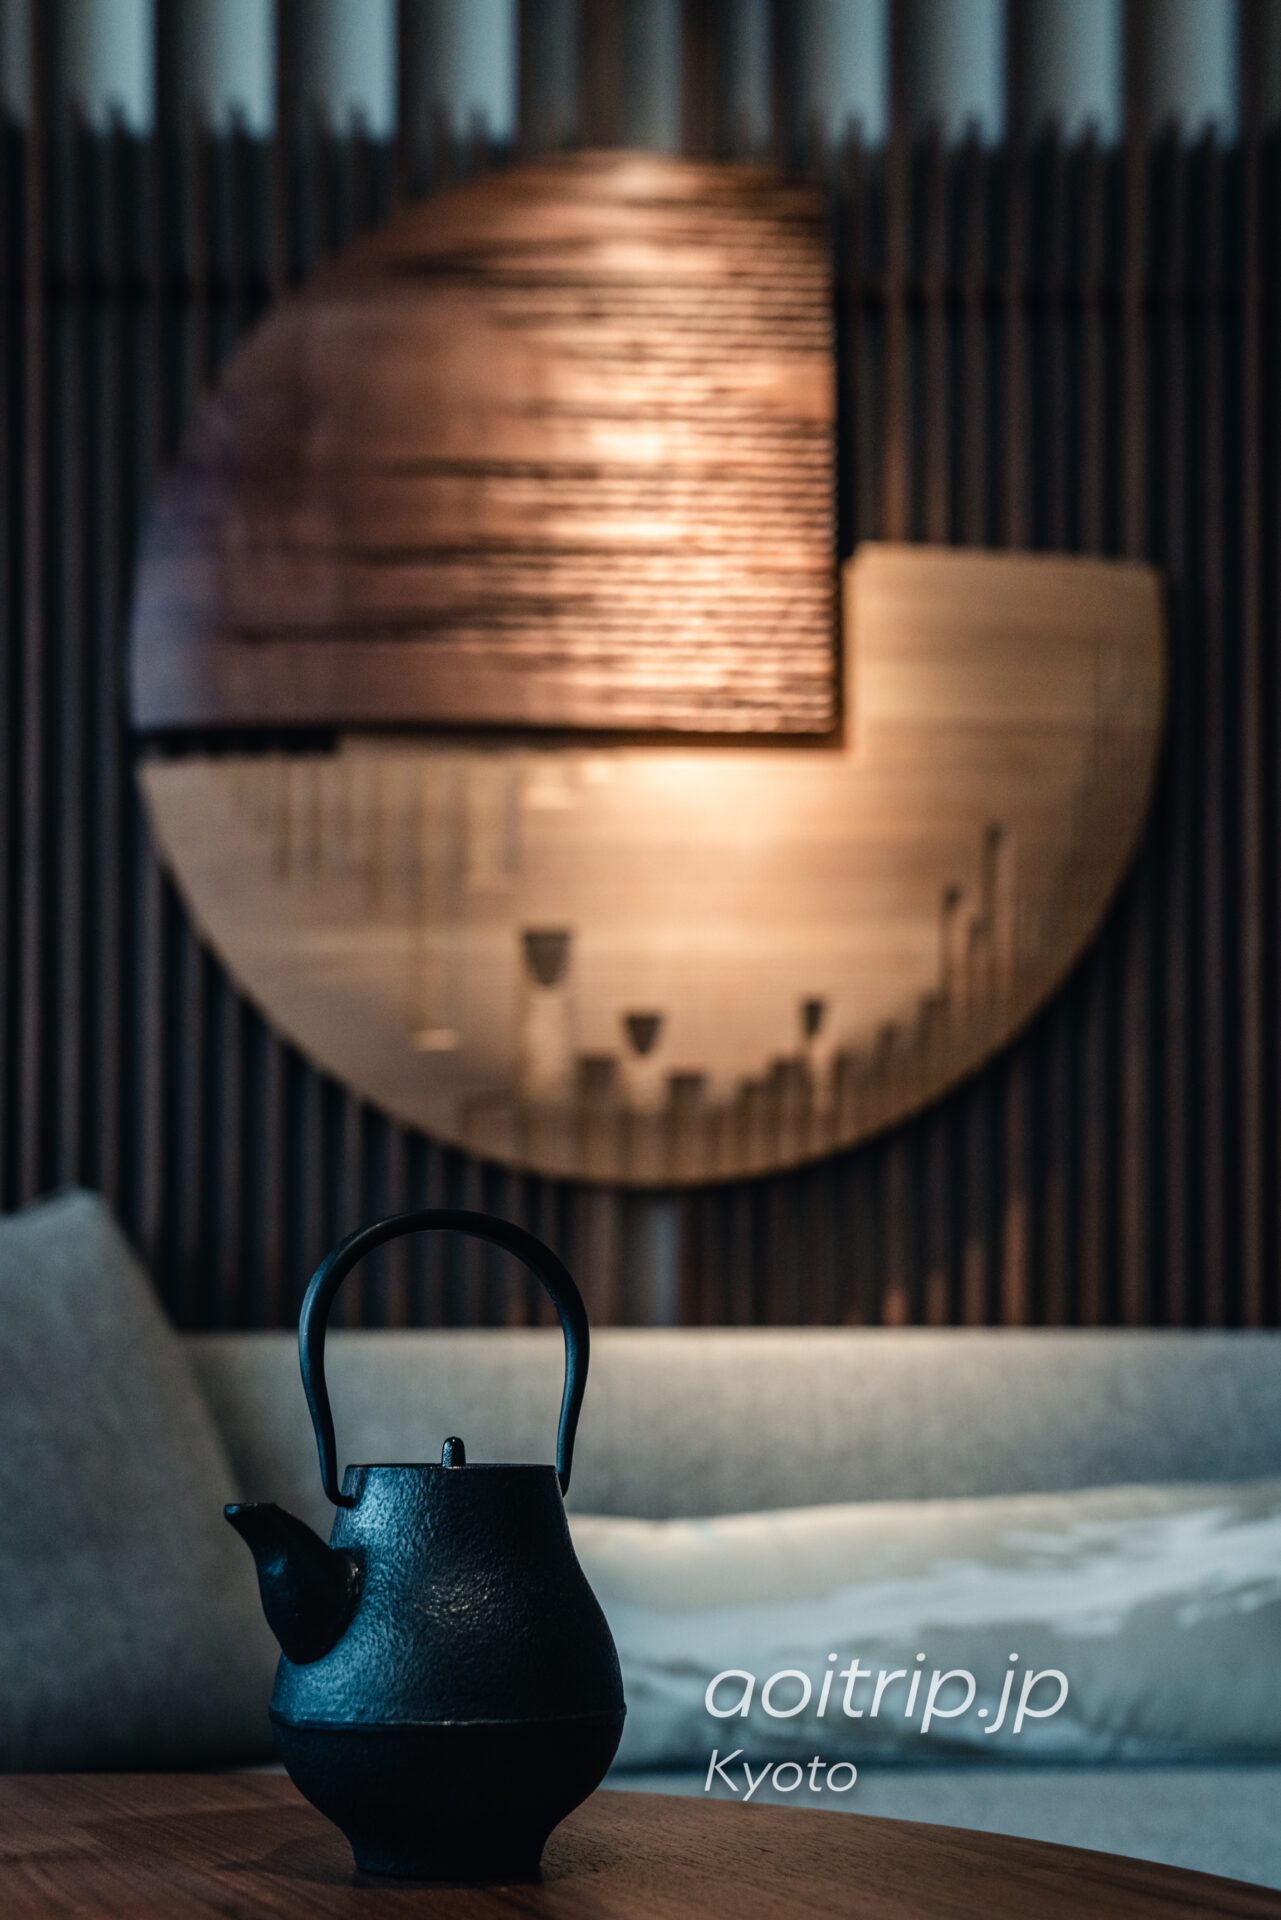 HOTEL THE MITSUI KYOTO アンドレフー氏がデザインの客室 東閣寒梅・雪山楼閣図